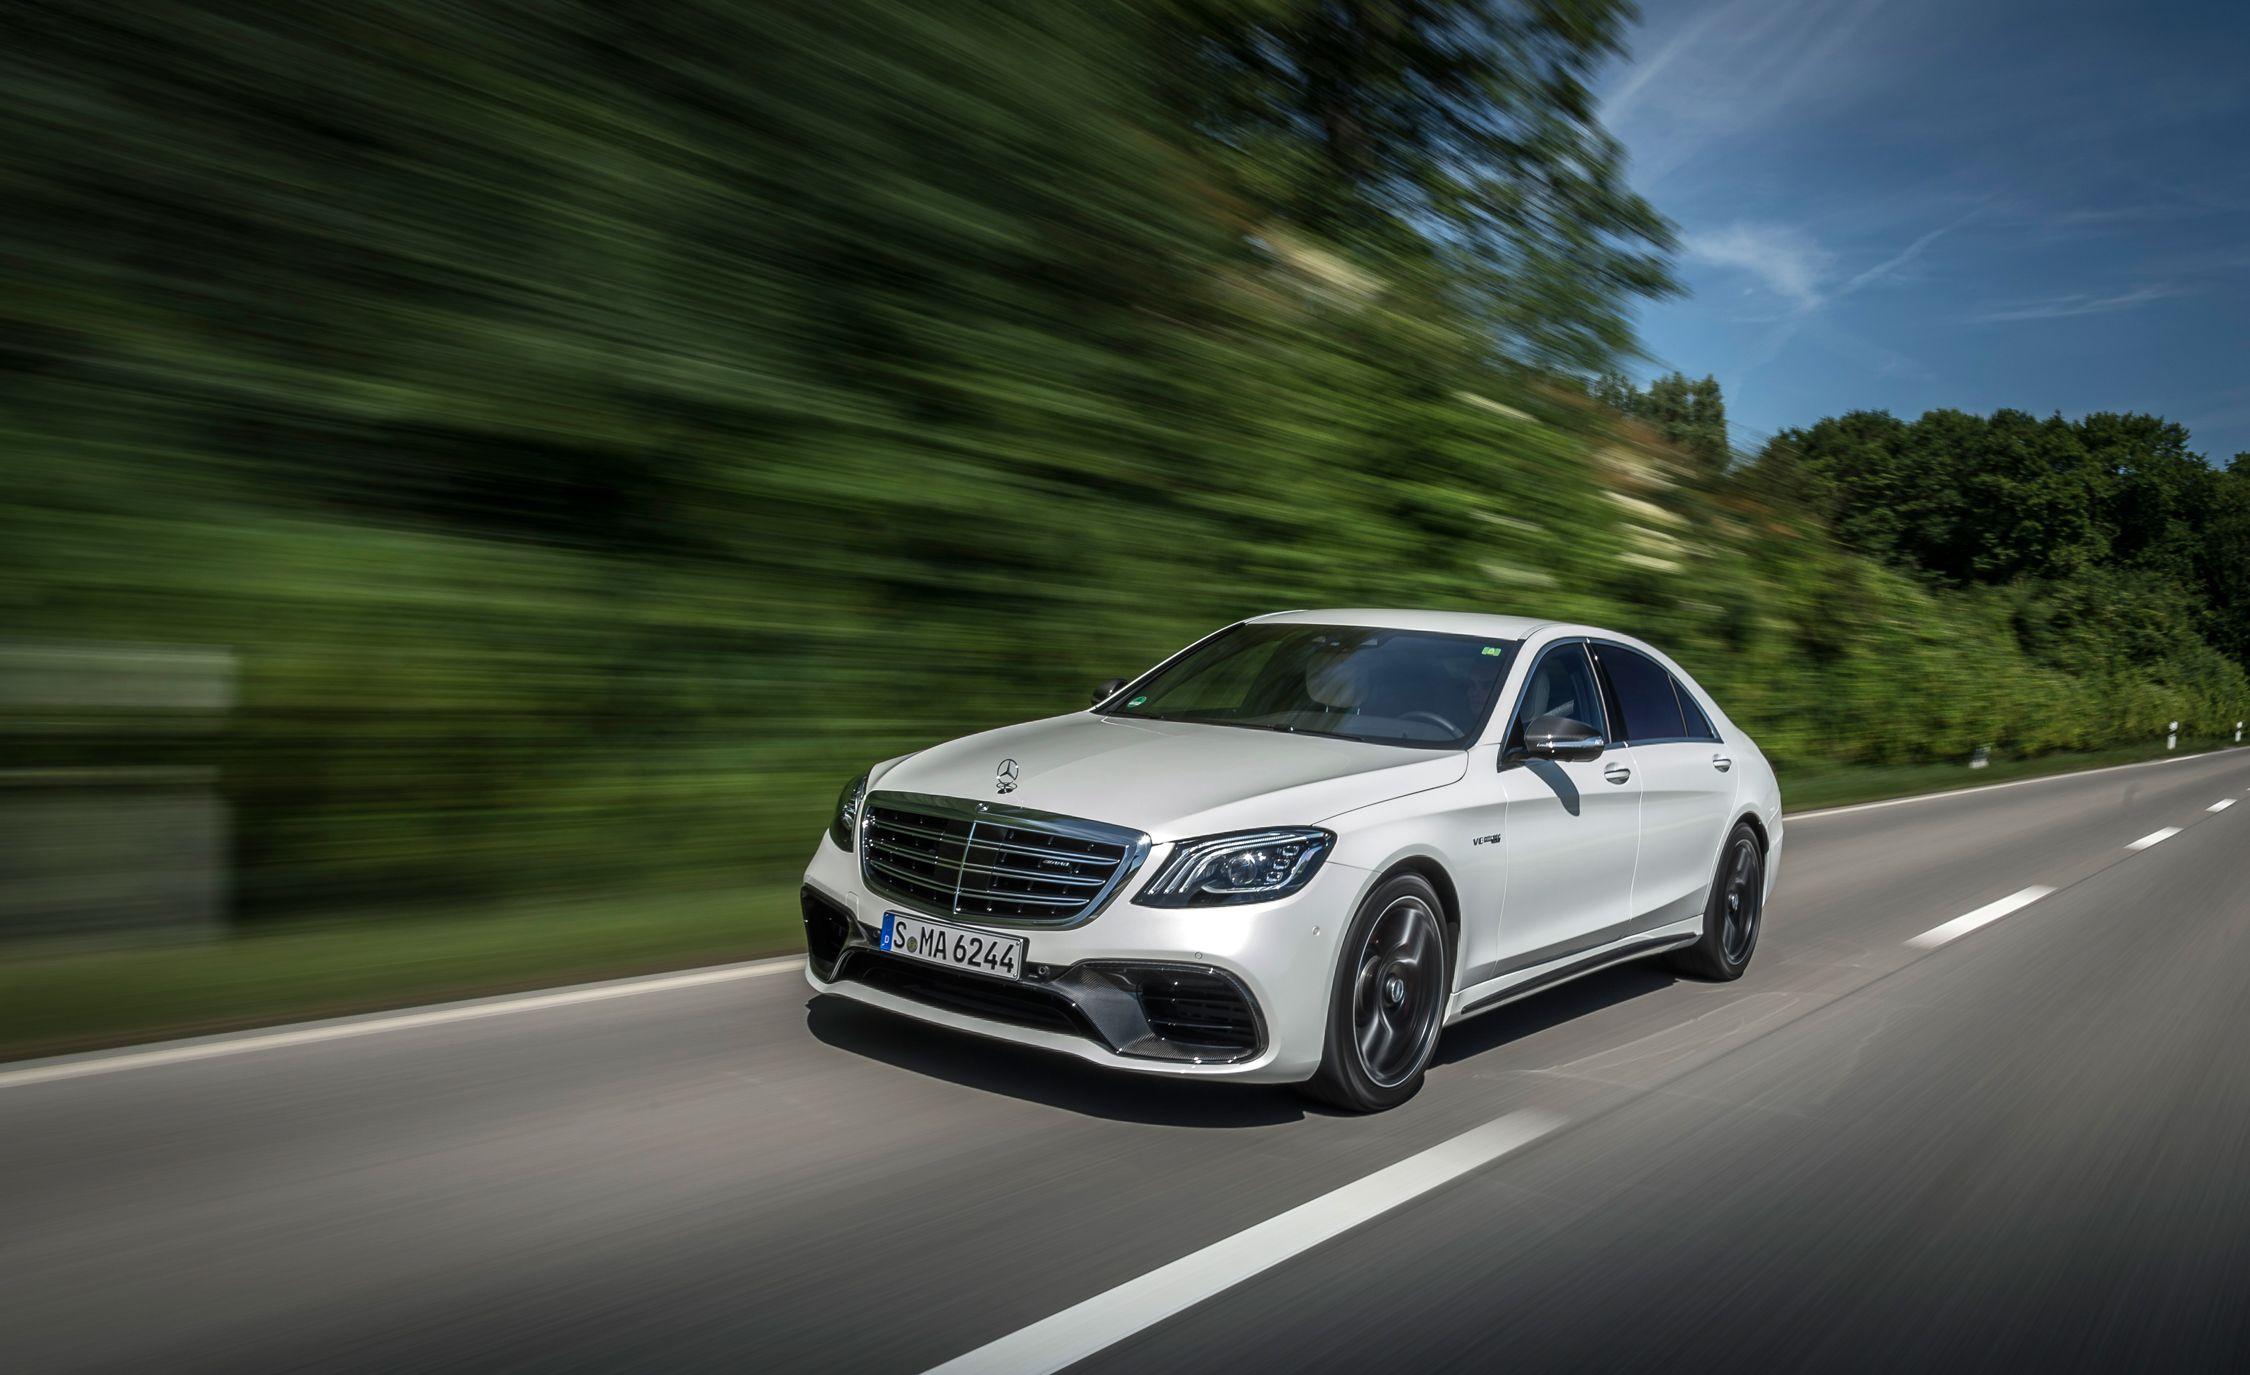 2018 mercedes benz s560. Modren 2018 And 2018 Mercedes Benz S560